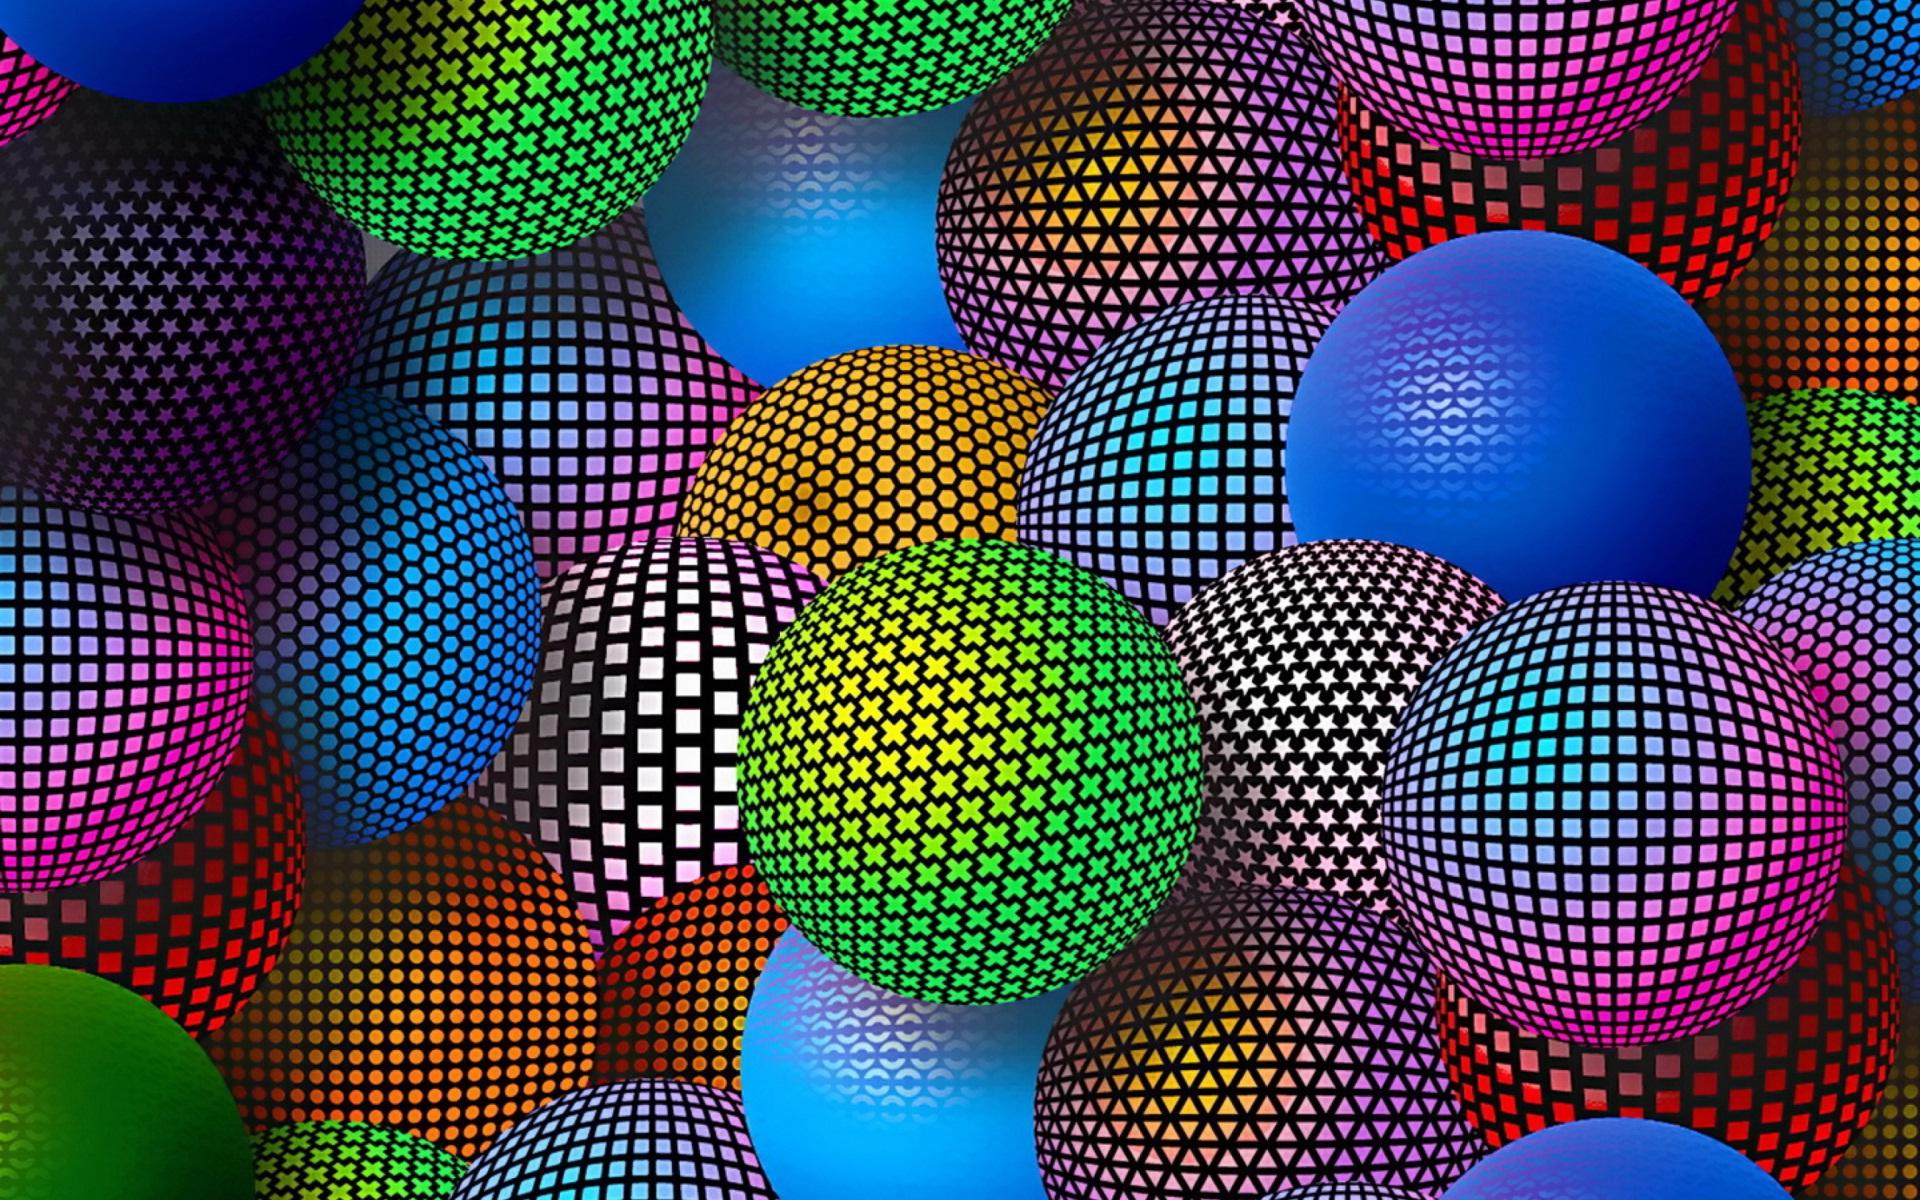 World Best Car Hd Wallpaper 1080p 3d Amazing Images Free Pixelstalk Net